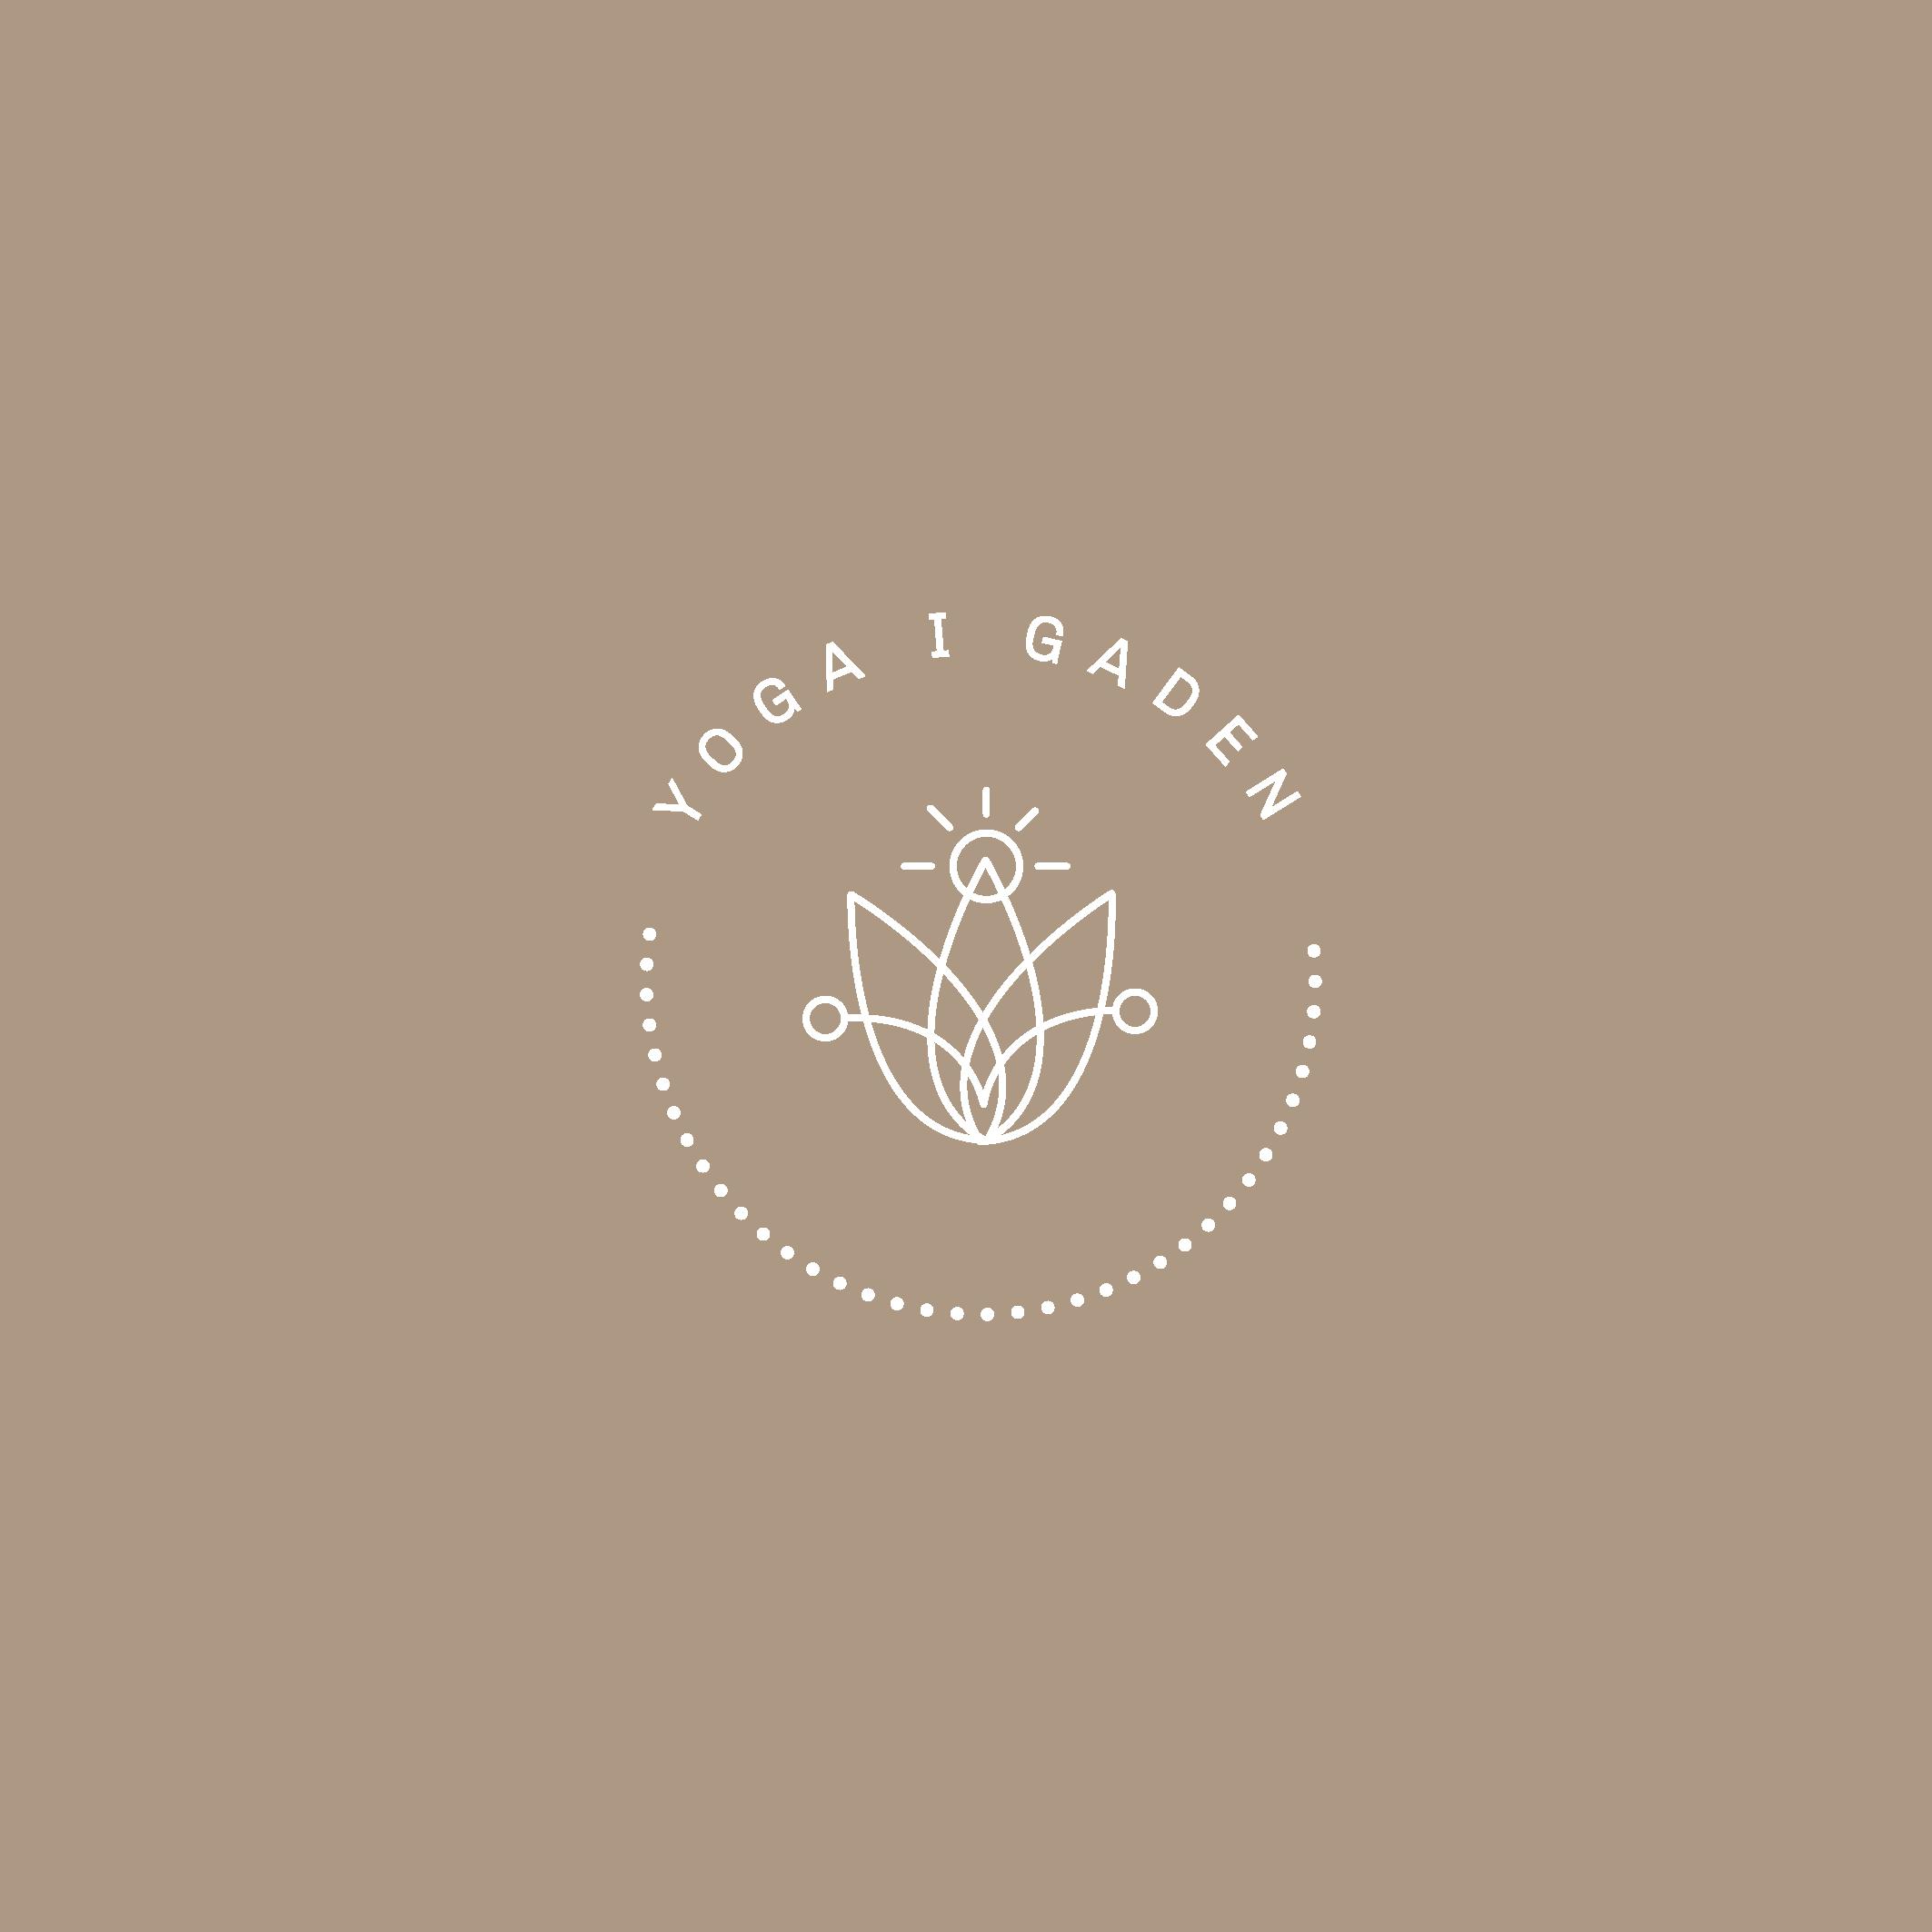 Logo_Yoga I Gaden4.jpg